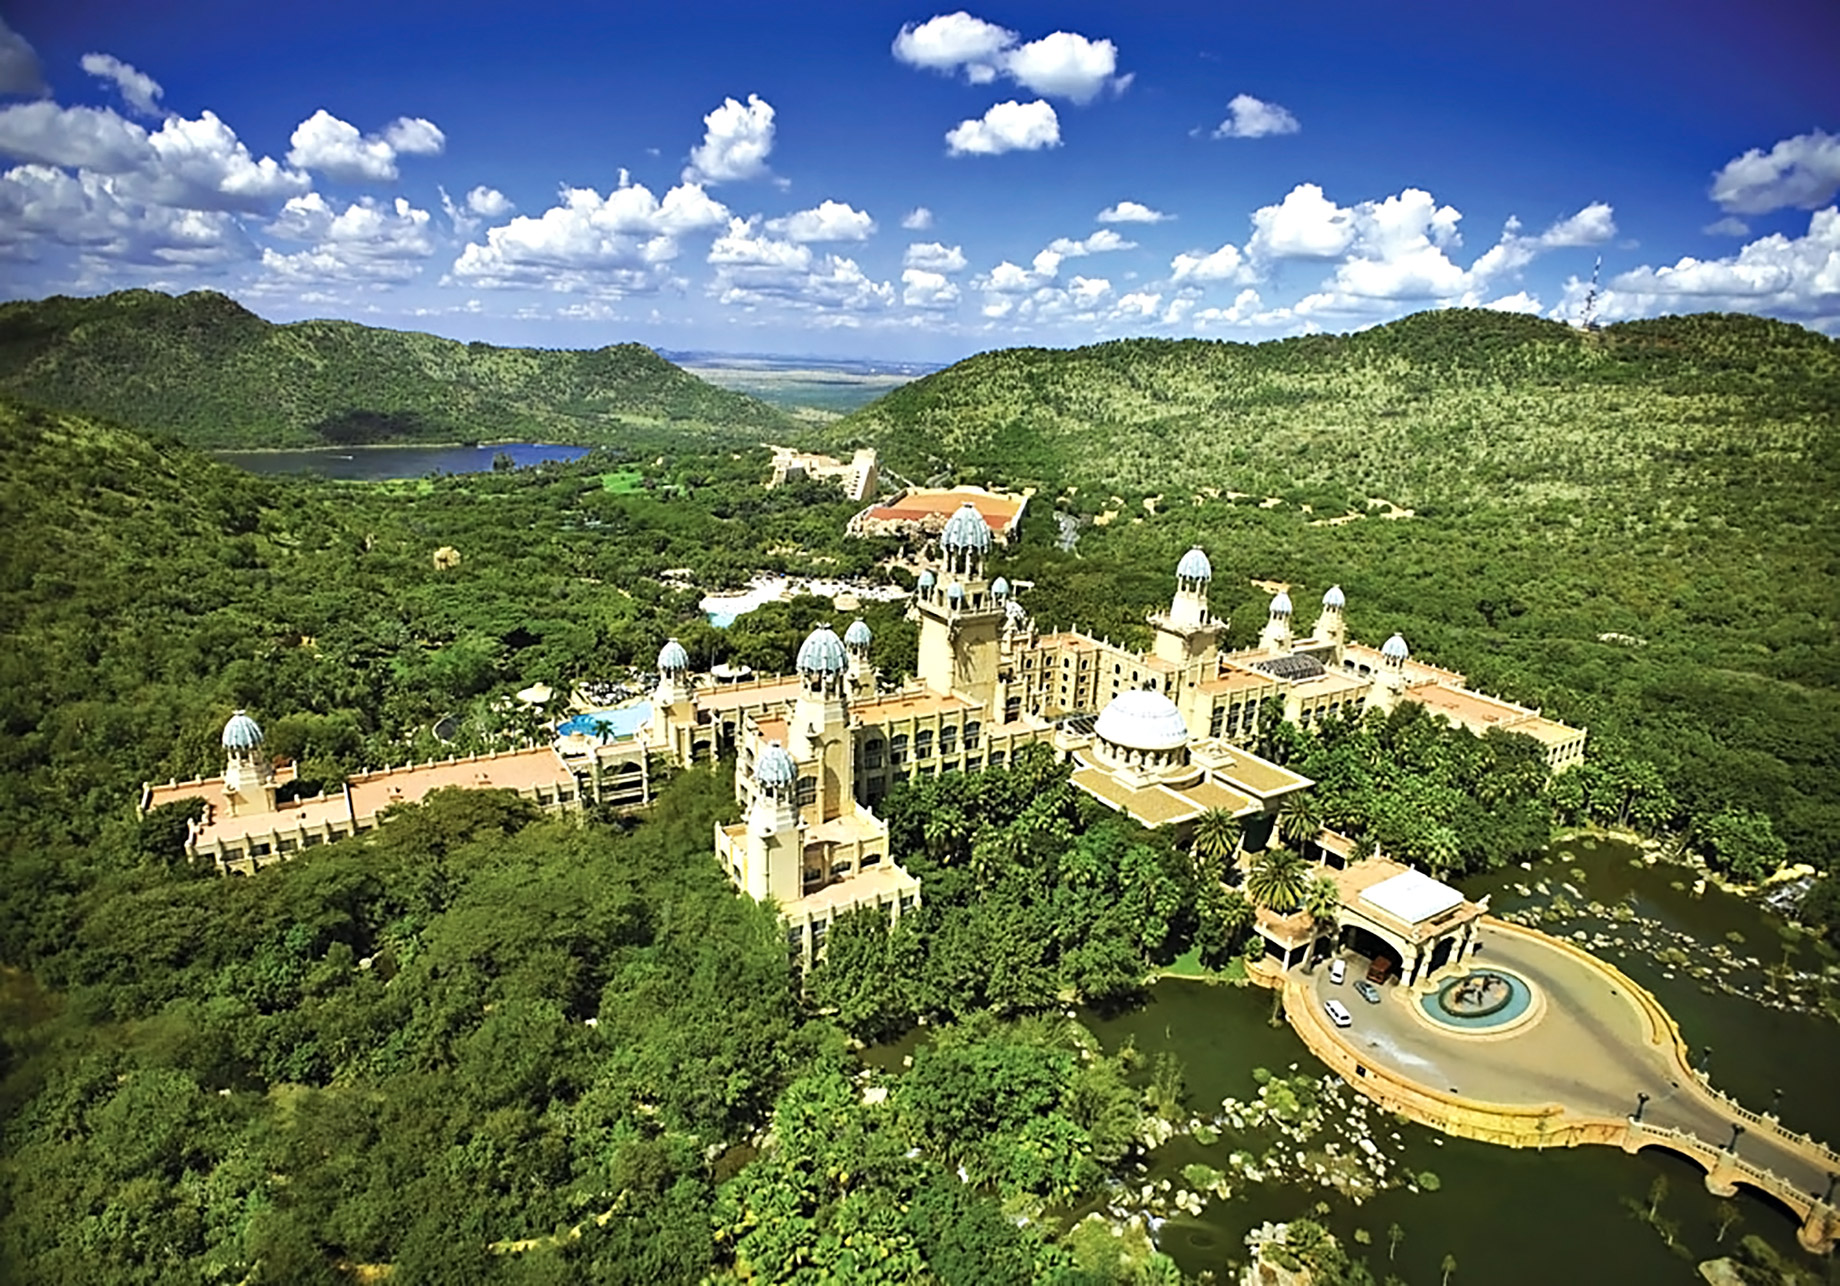 South Africa's Sun City Casino